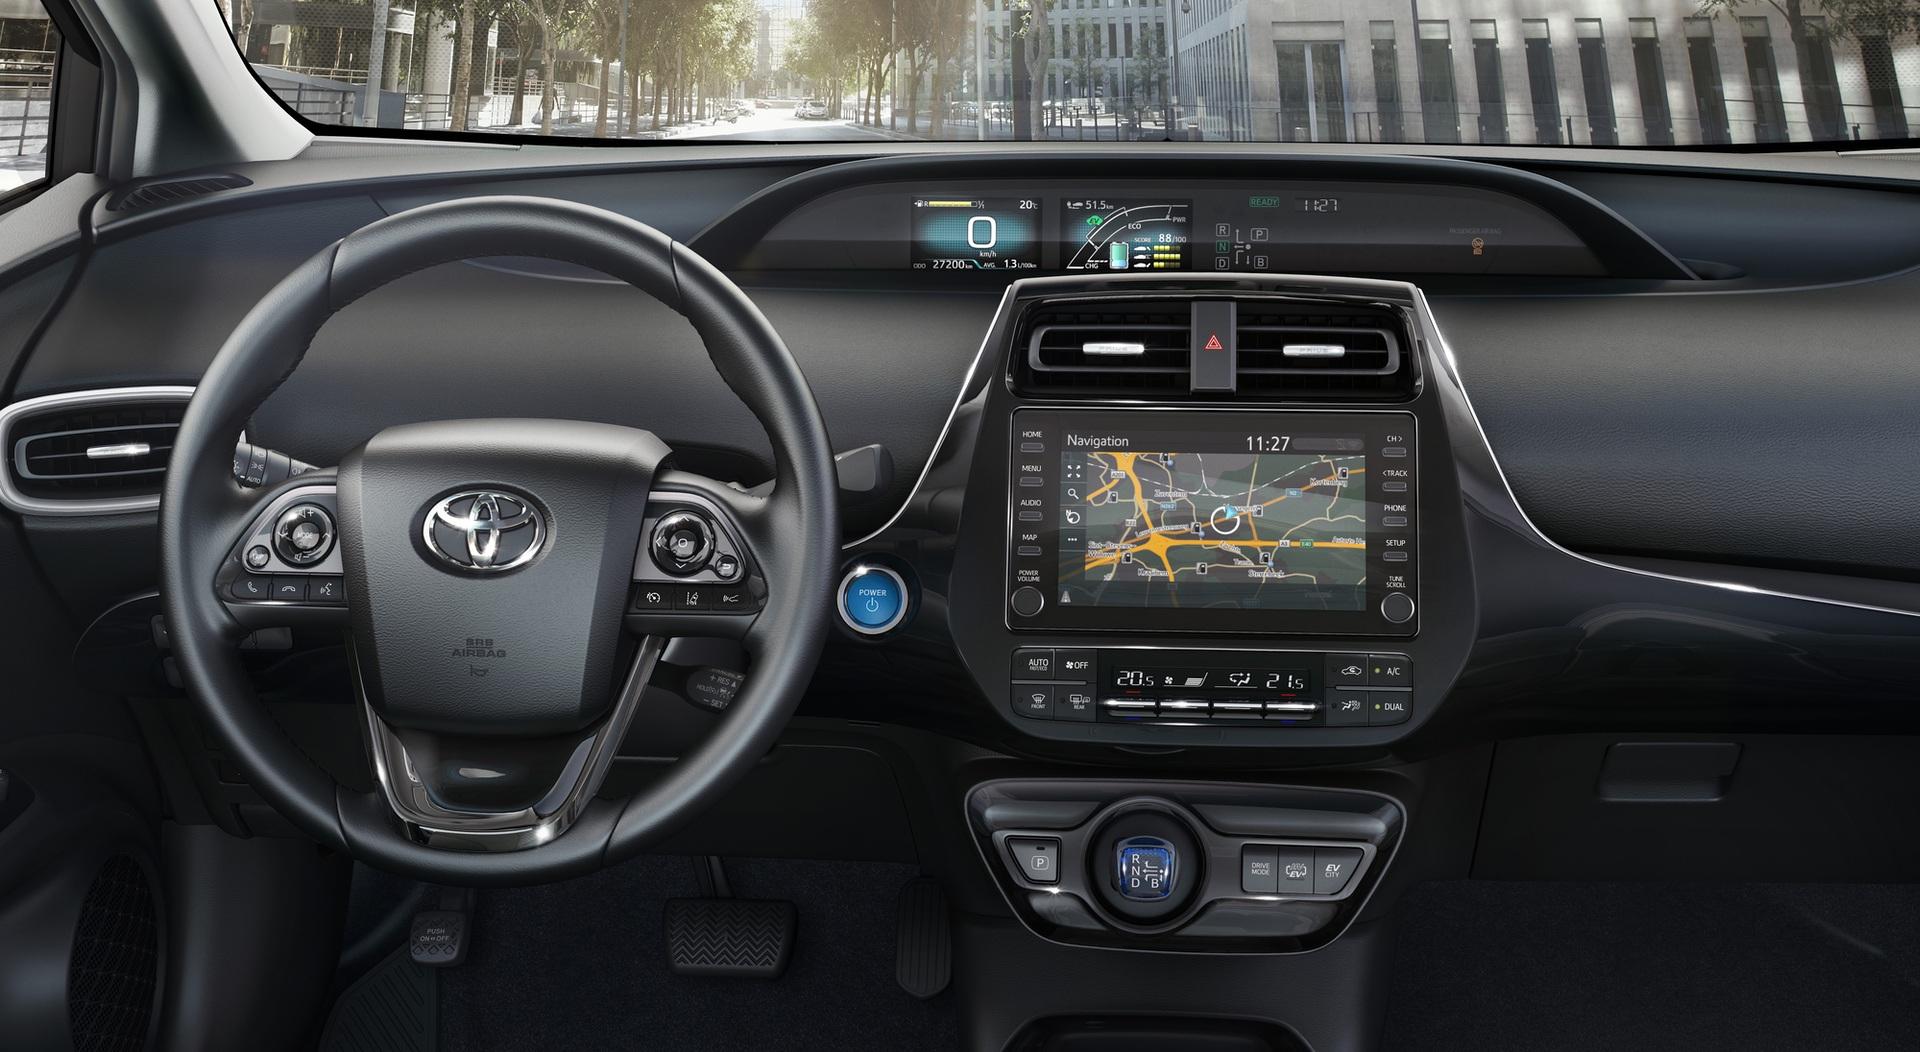 2019_Toyota_Prius_Plug-in_Hybrid_0001